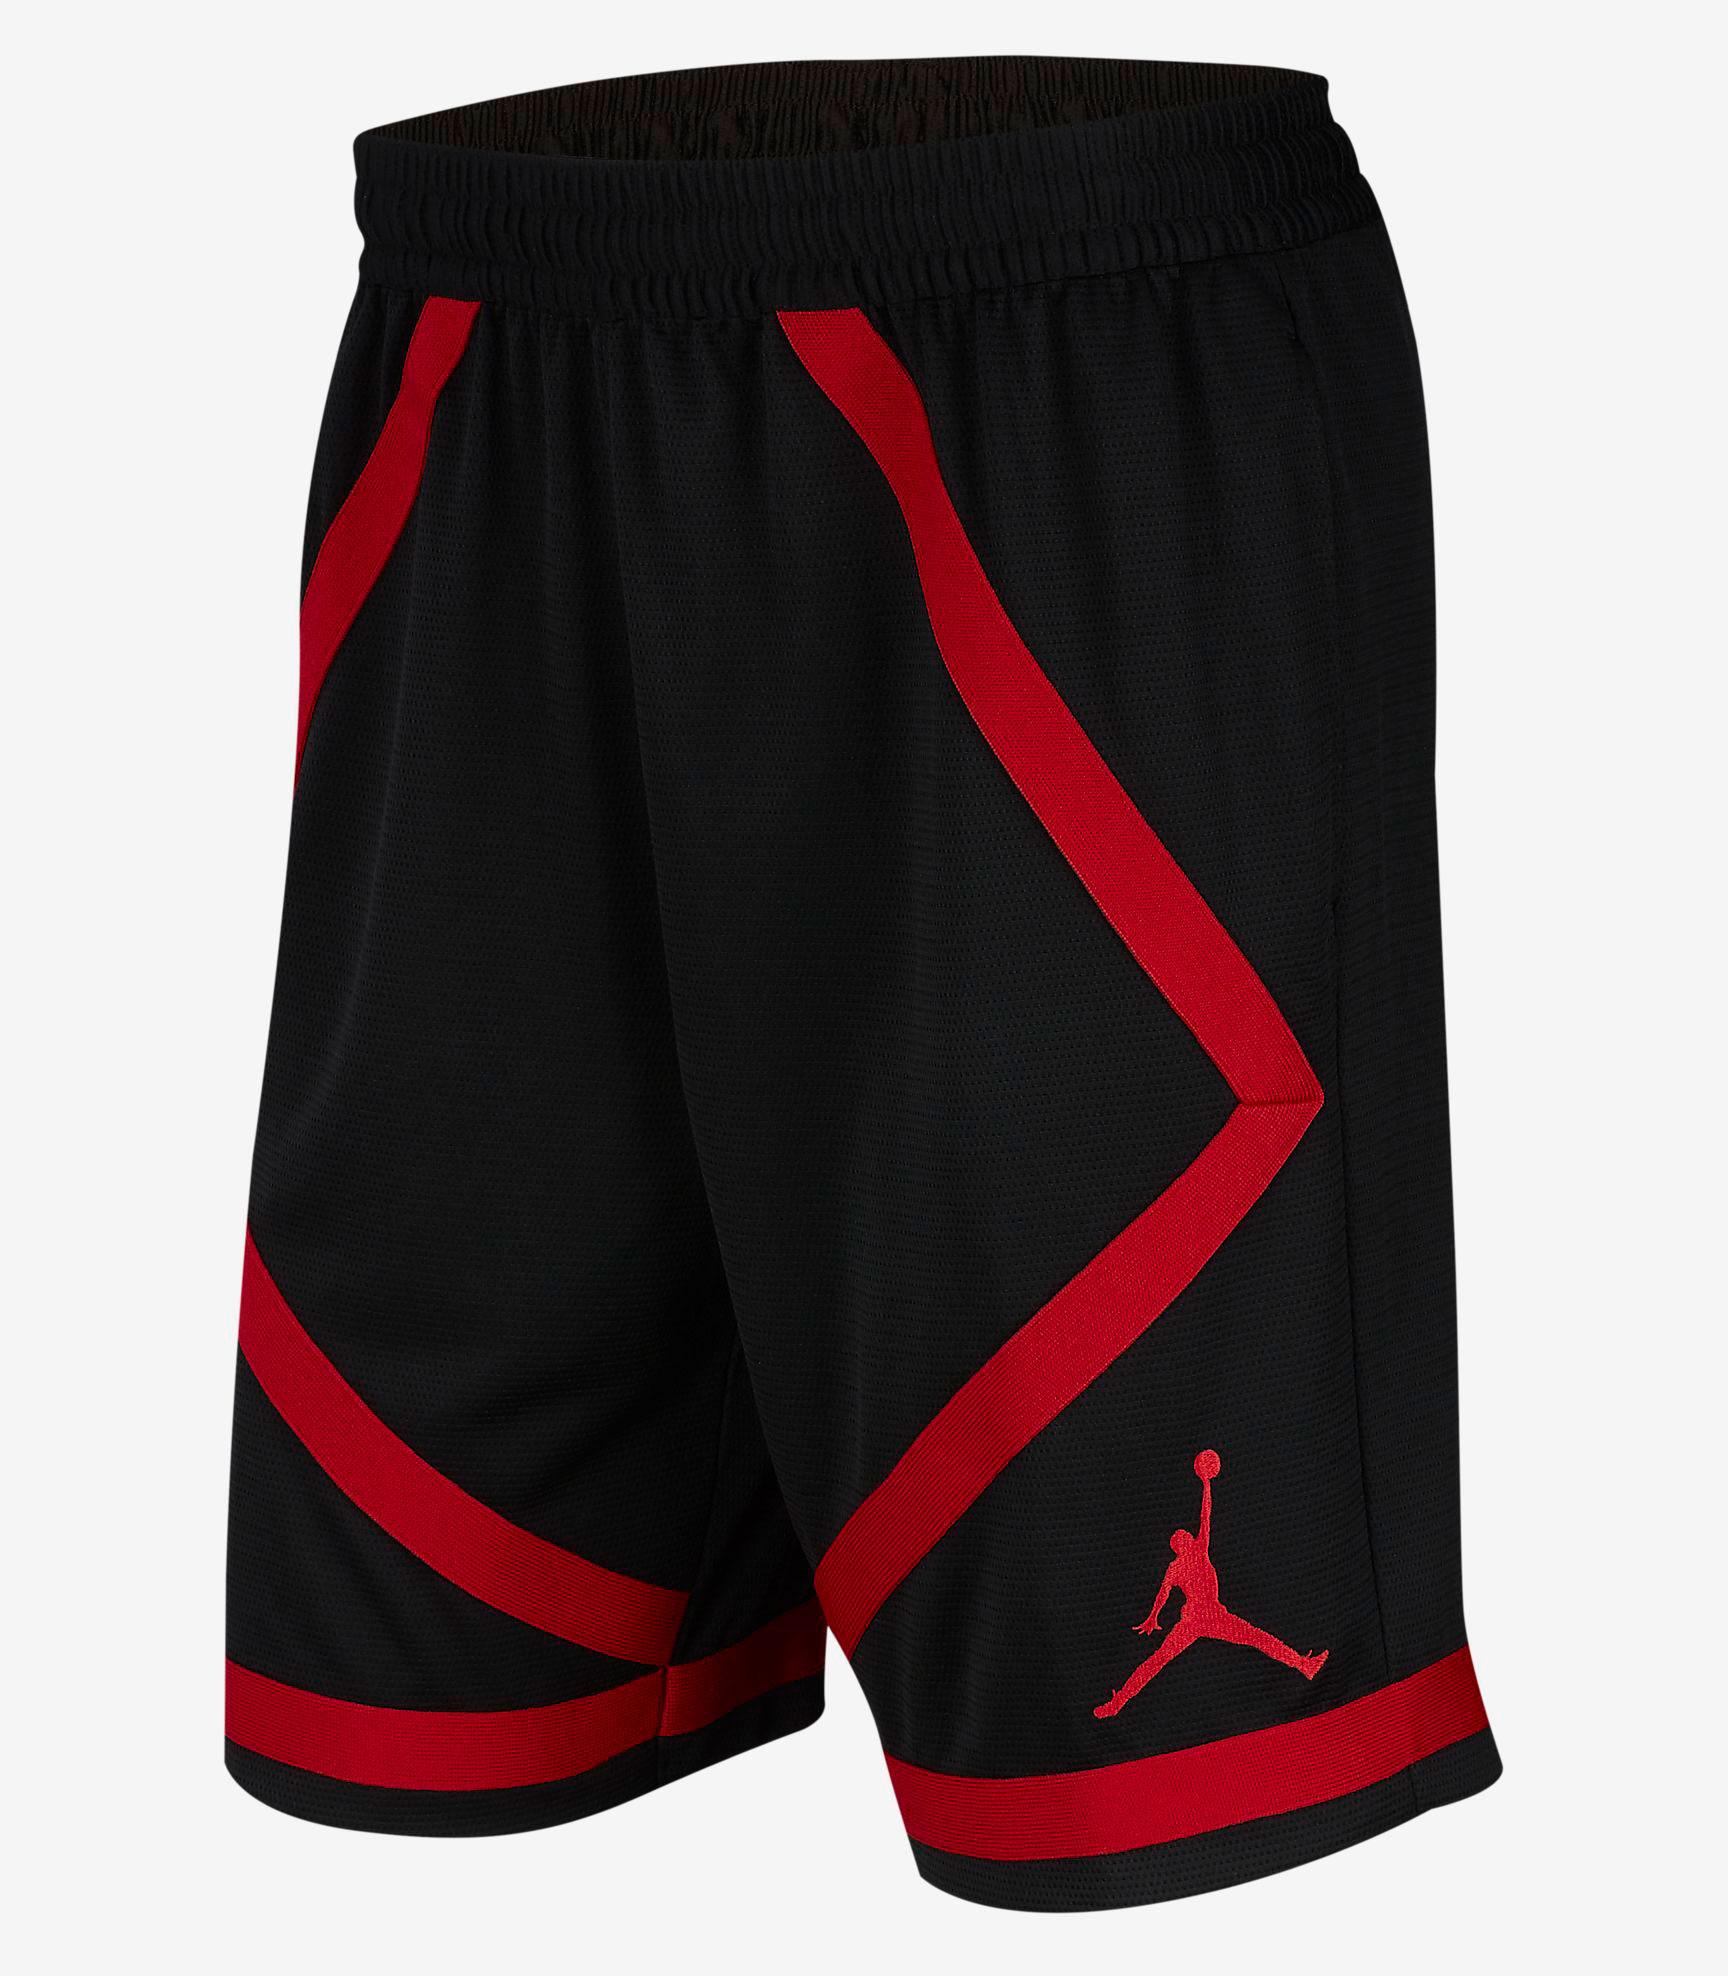 air-jordan-3-tinker-air-max-1-shorts-match-4